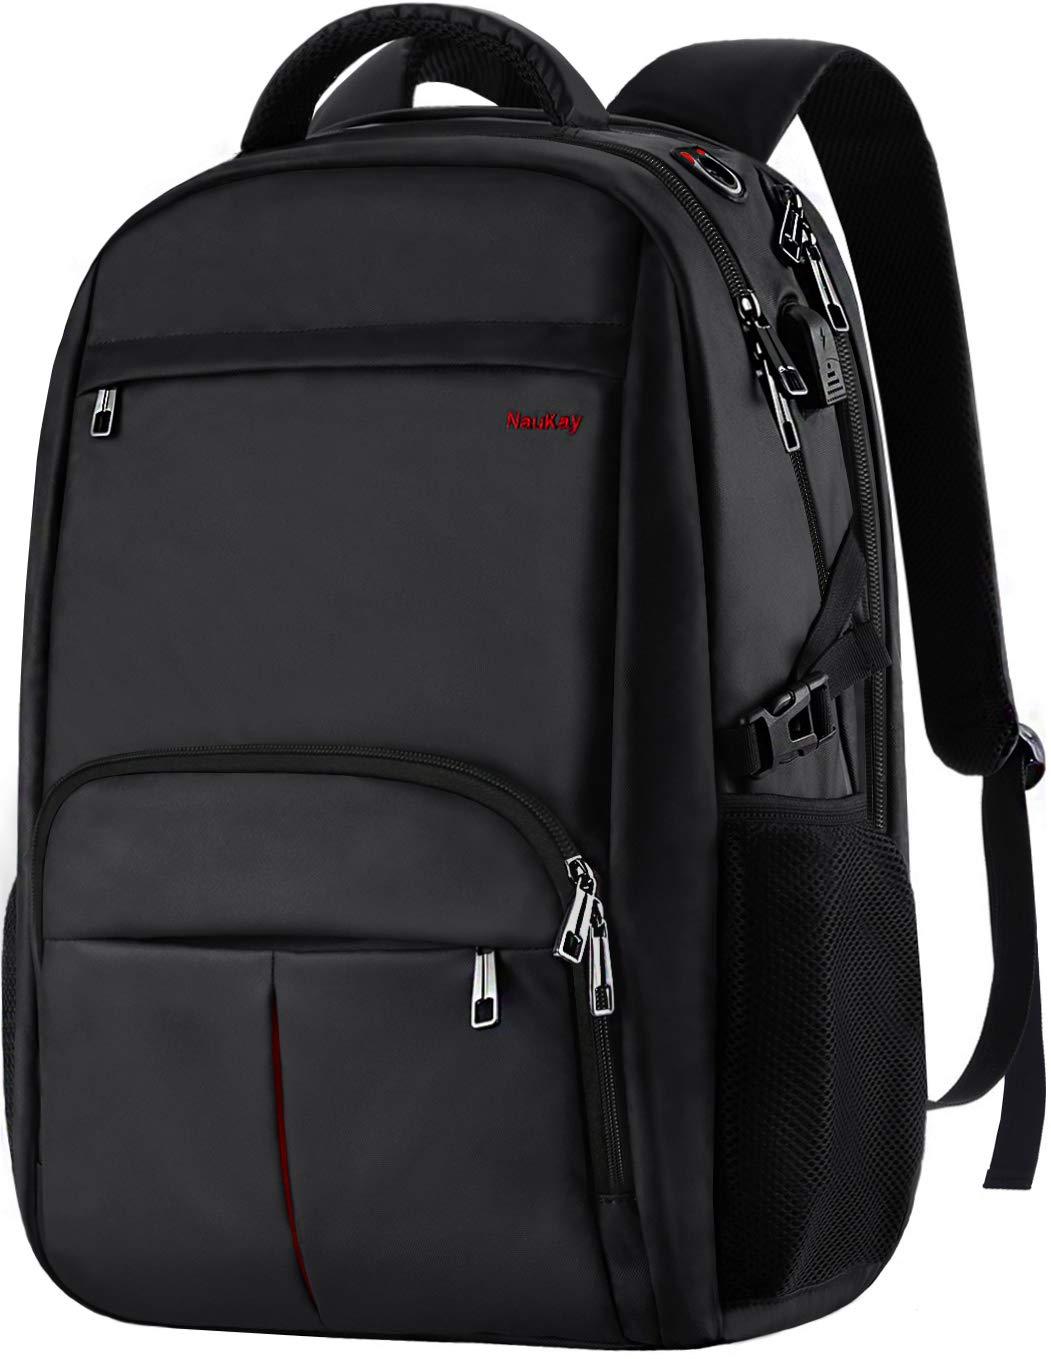 Business Slim Travel Laptop Backpack